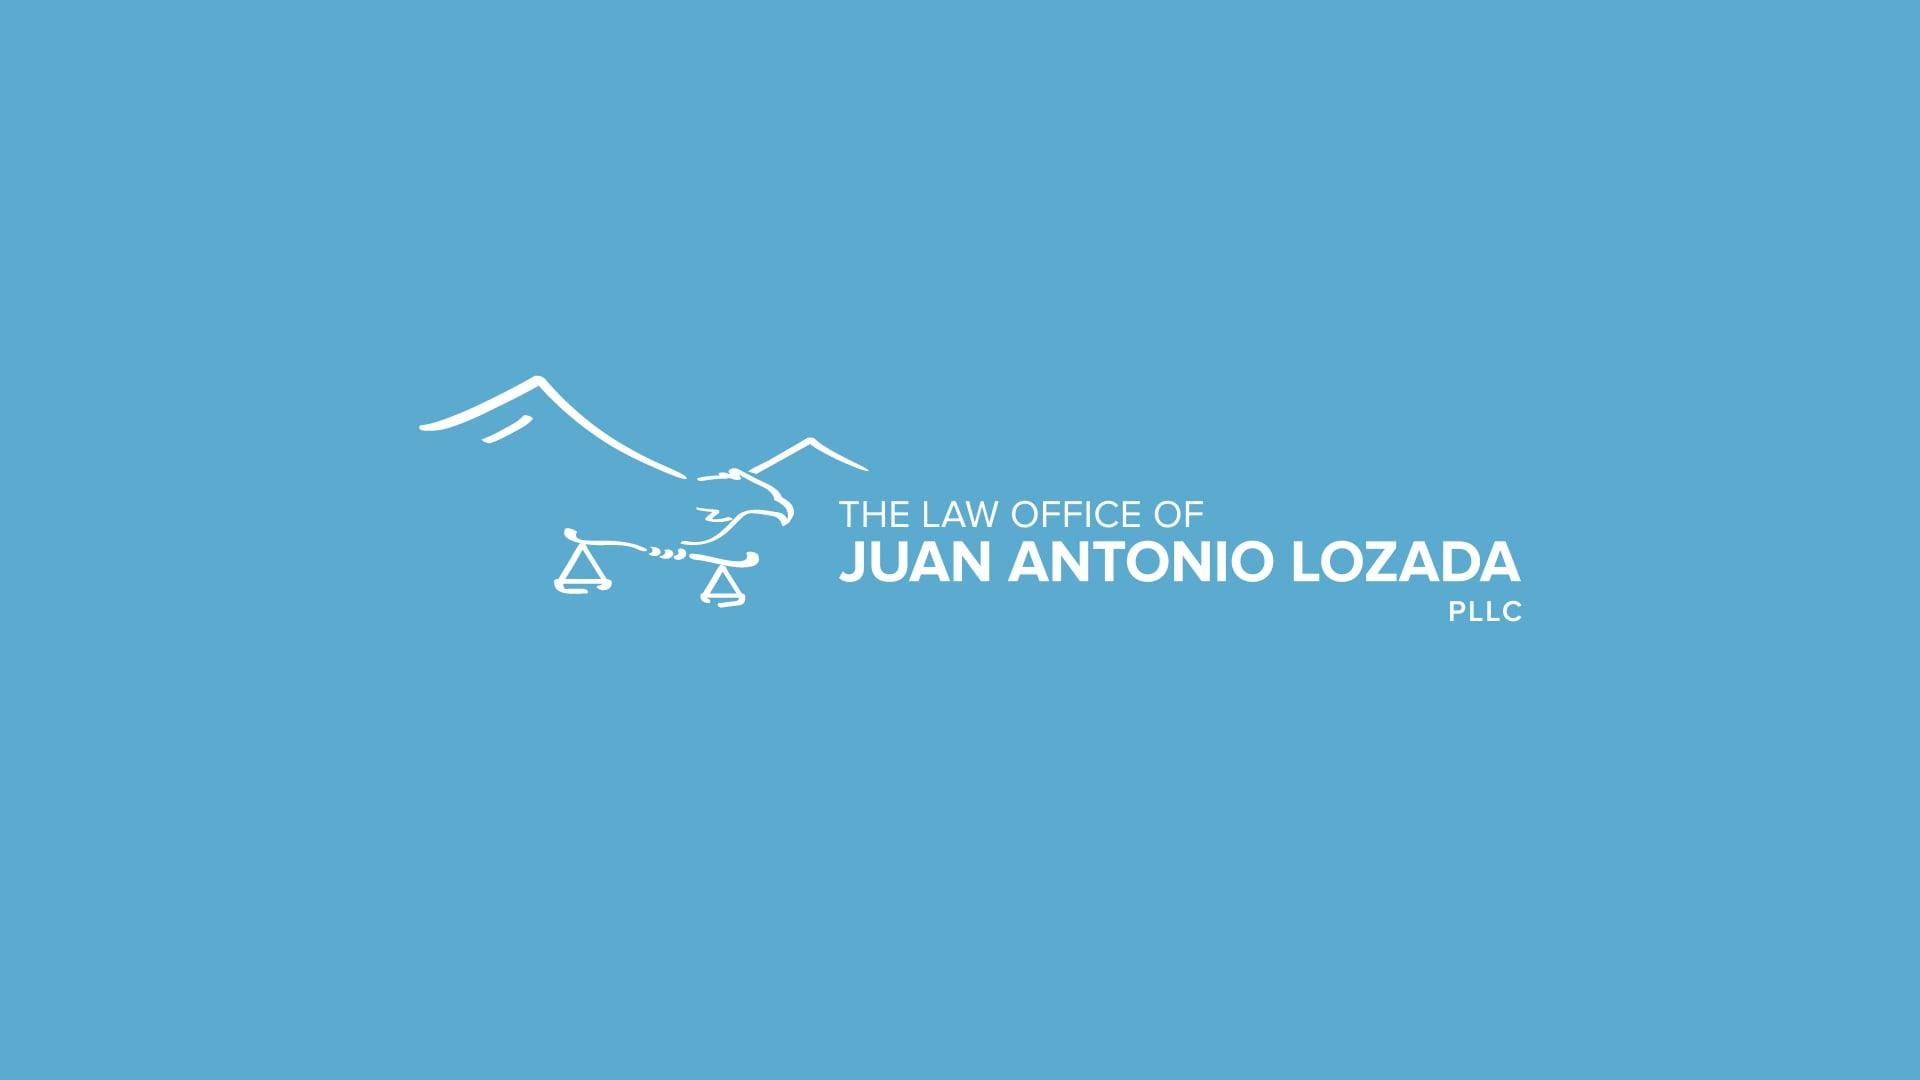 Company Statement - Law Office of Juan Antonio Lozada